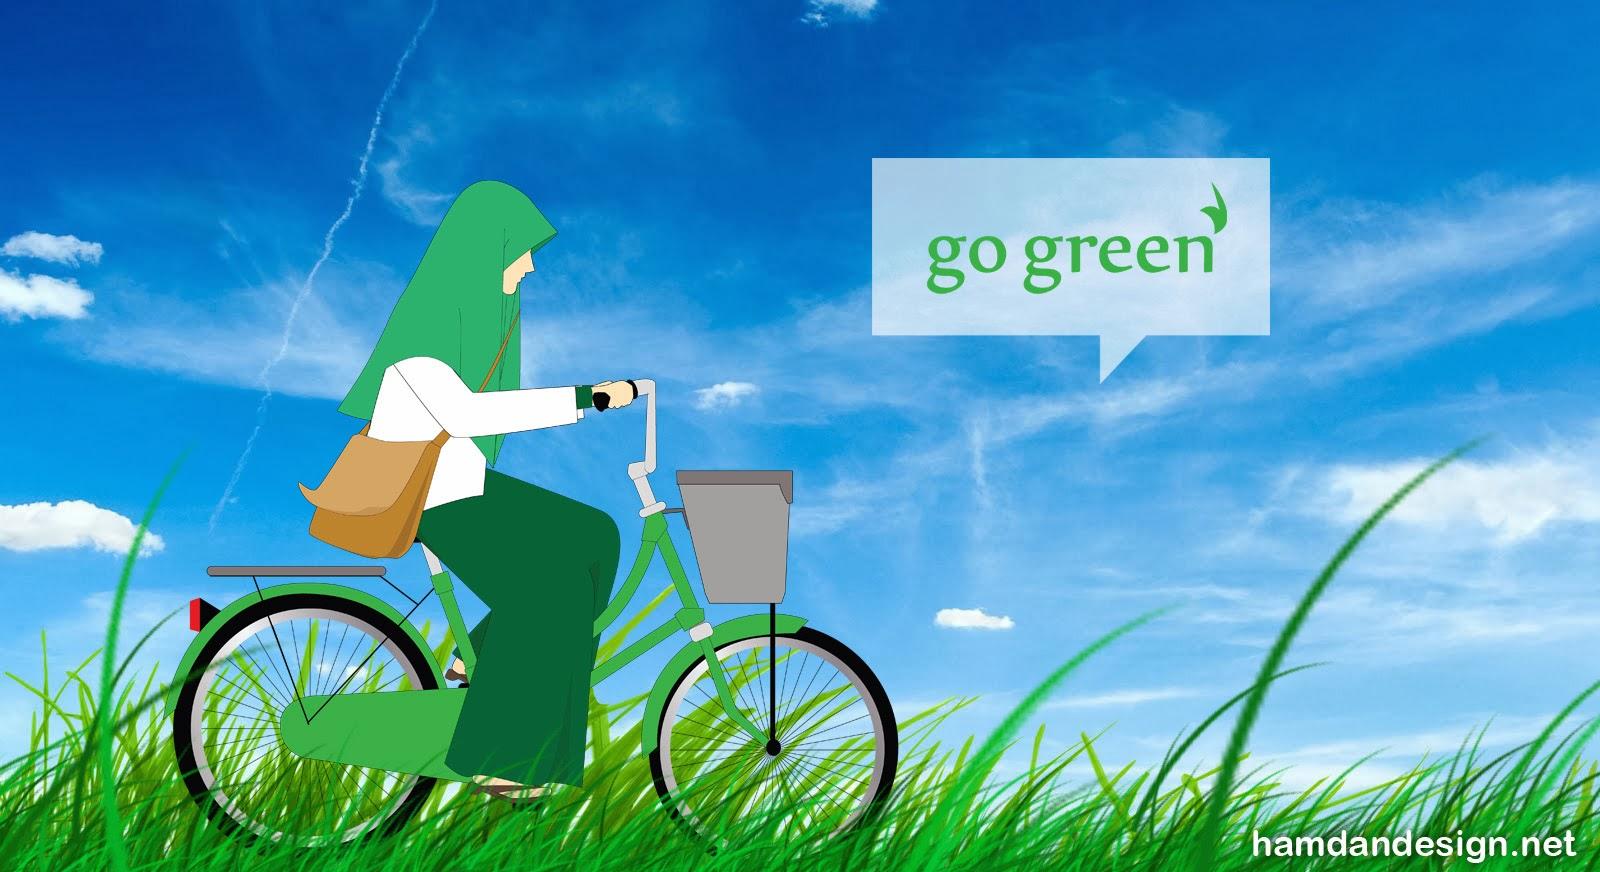 Kartun Akhwat Muslimah Bersepeda Go Green Kartun Dakwah Islam